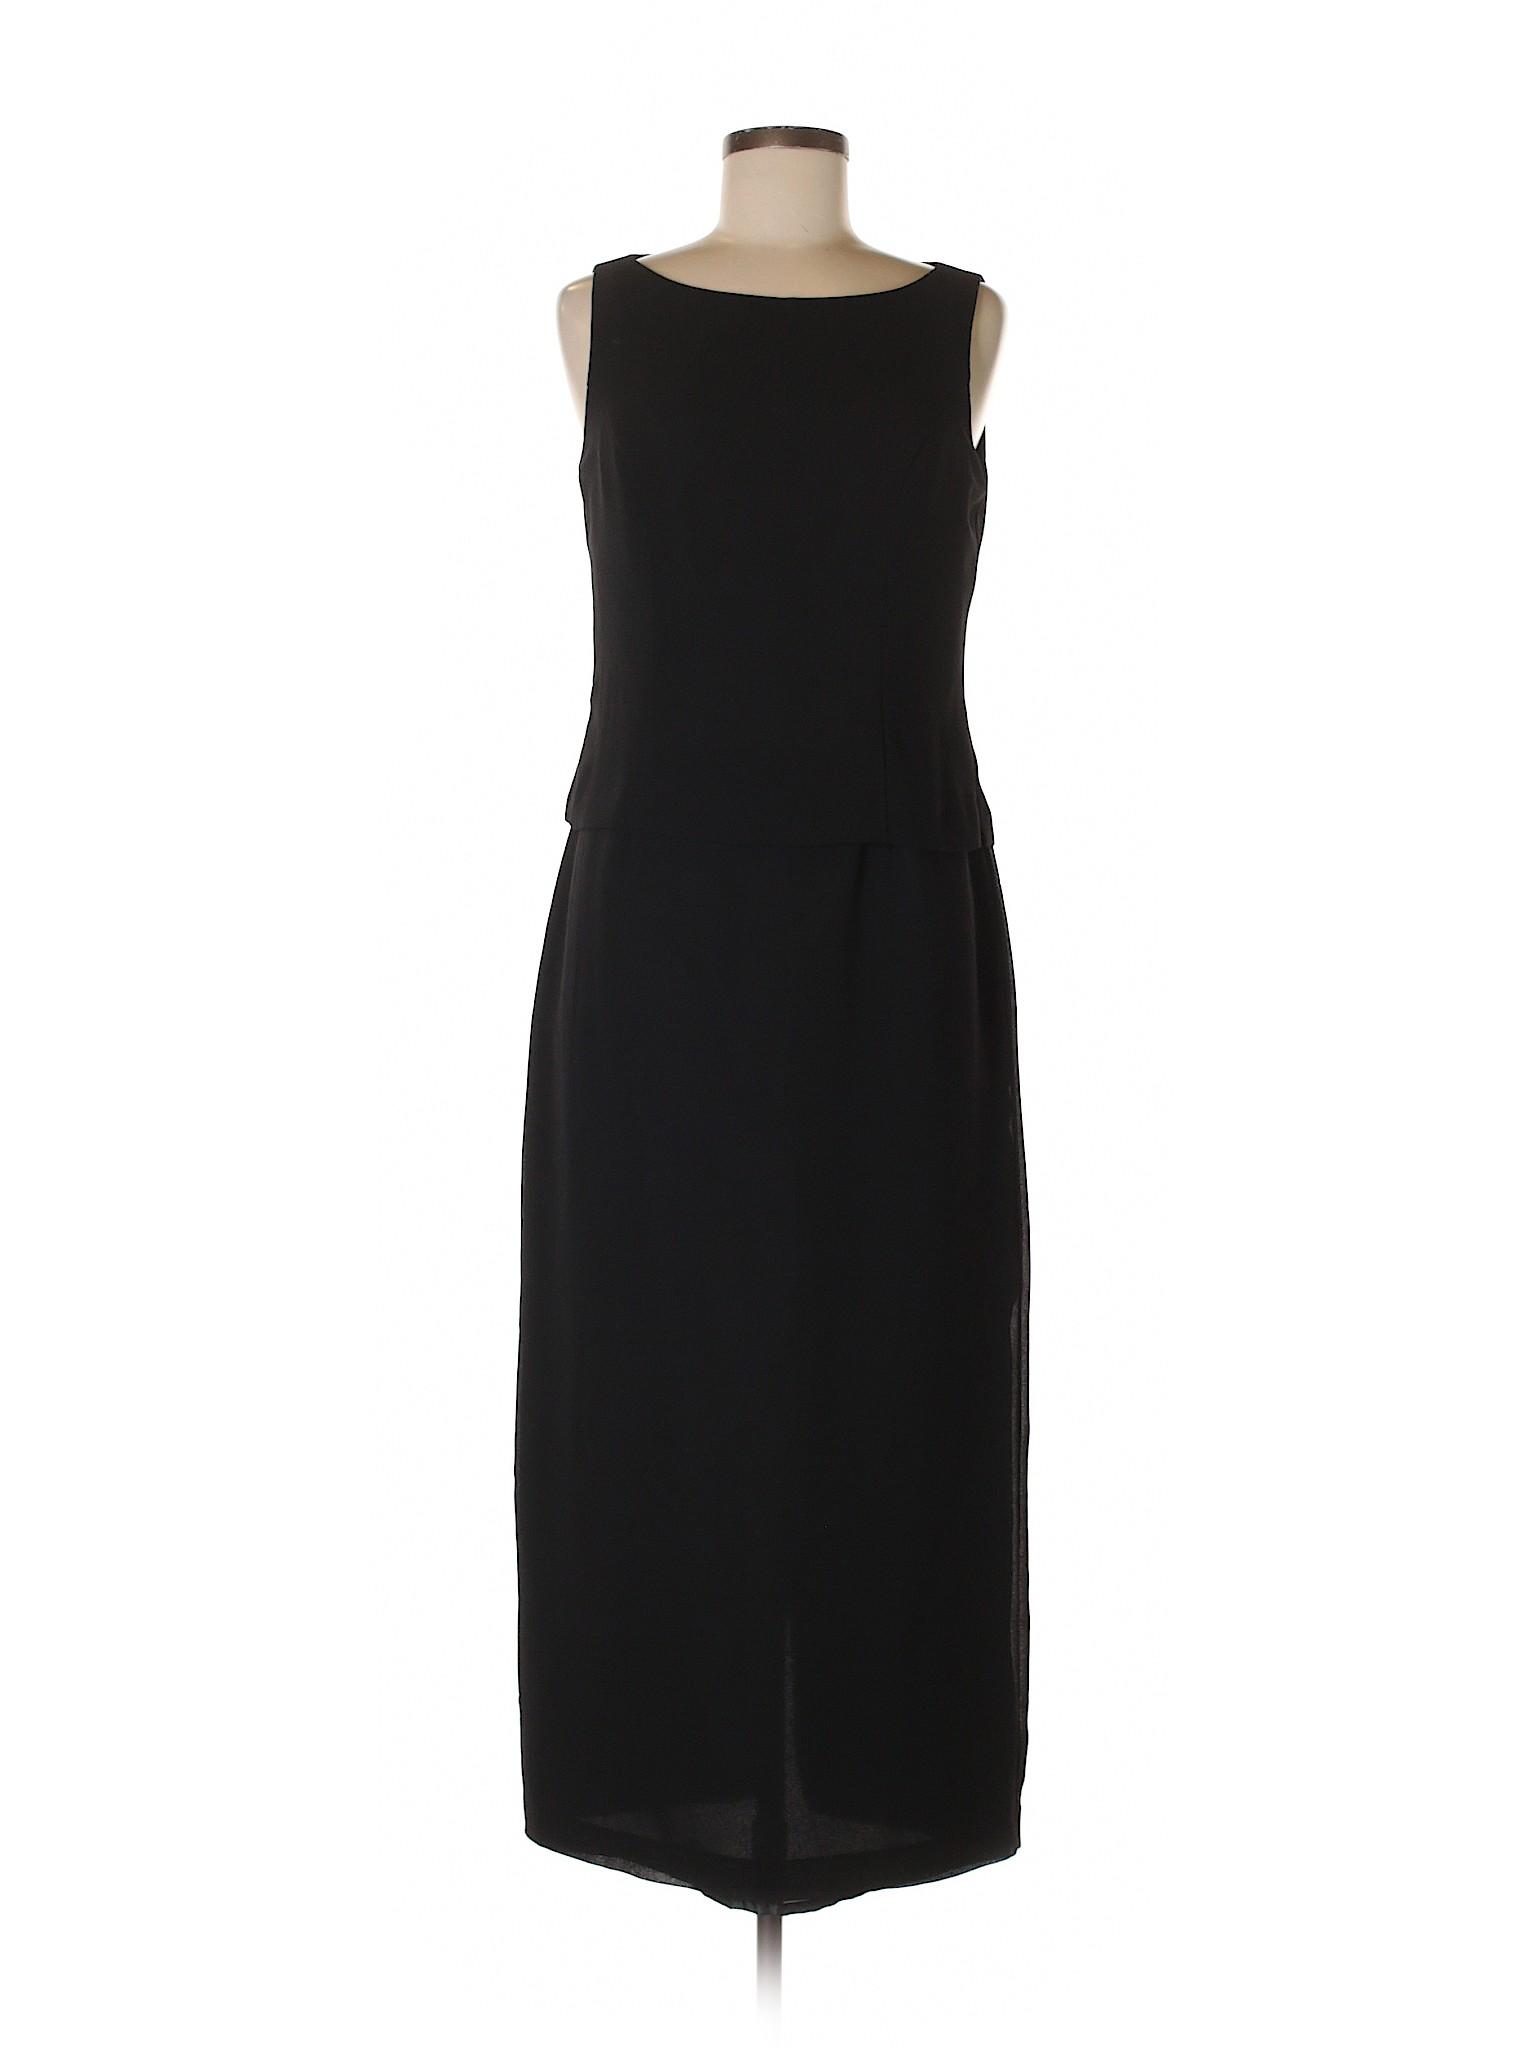 Dress Howard Boutique Casual Jessica winter fwSqnRTP